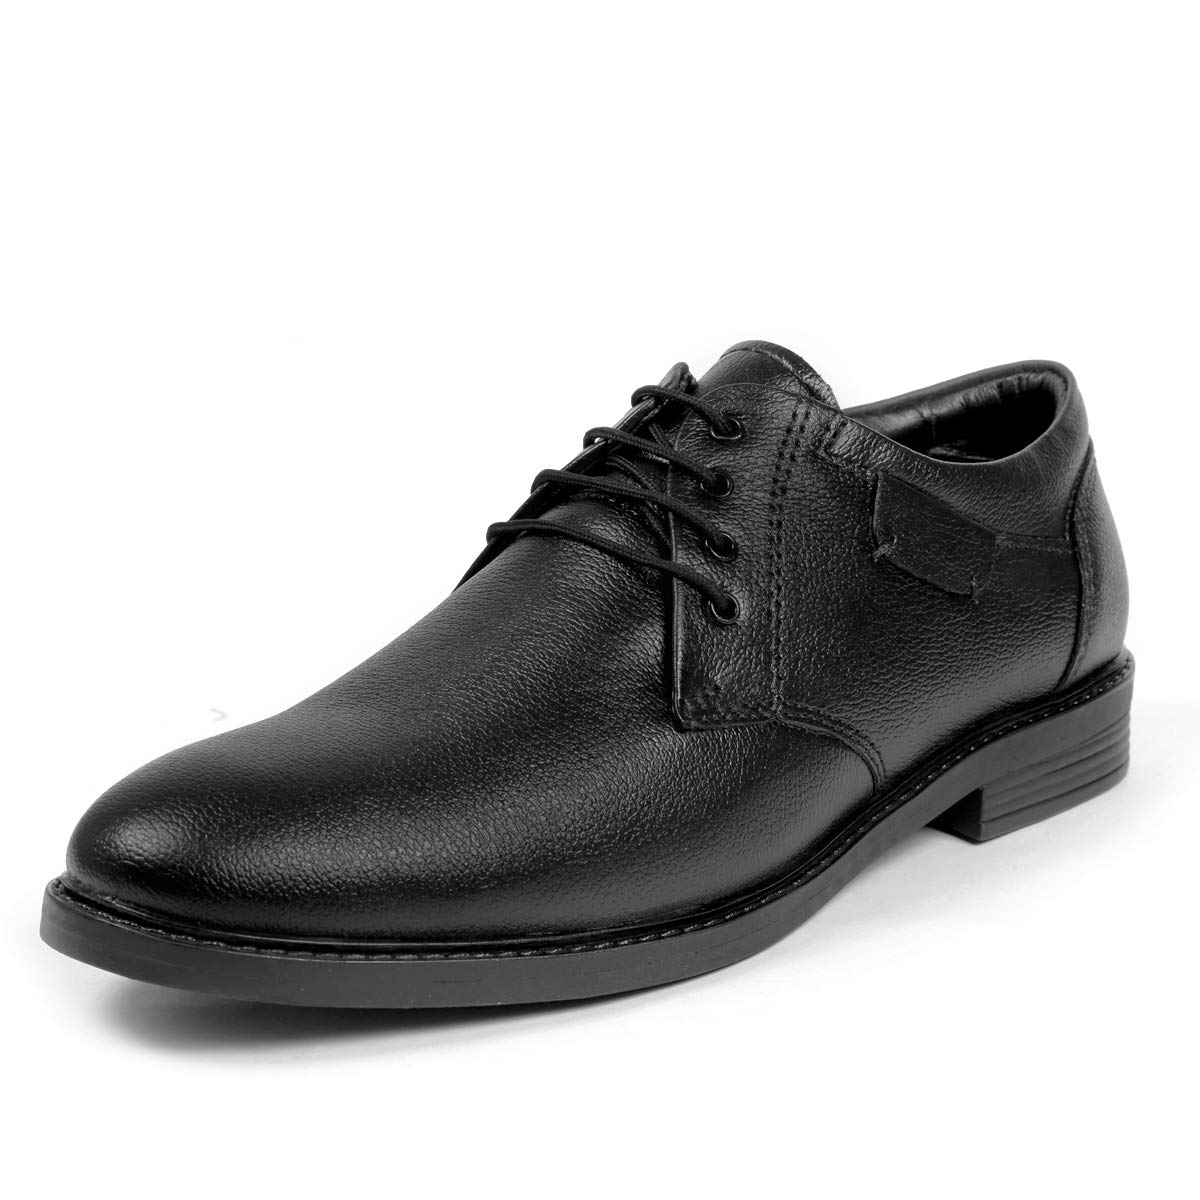 Men's Leather Dress Shoes Slip-on Plain